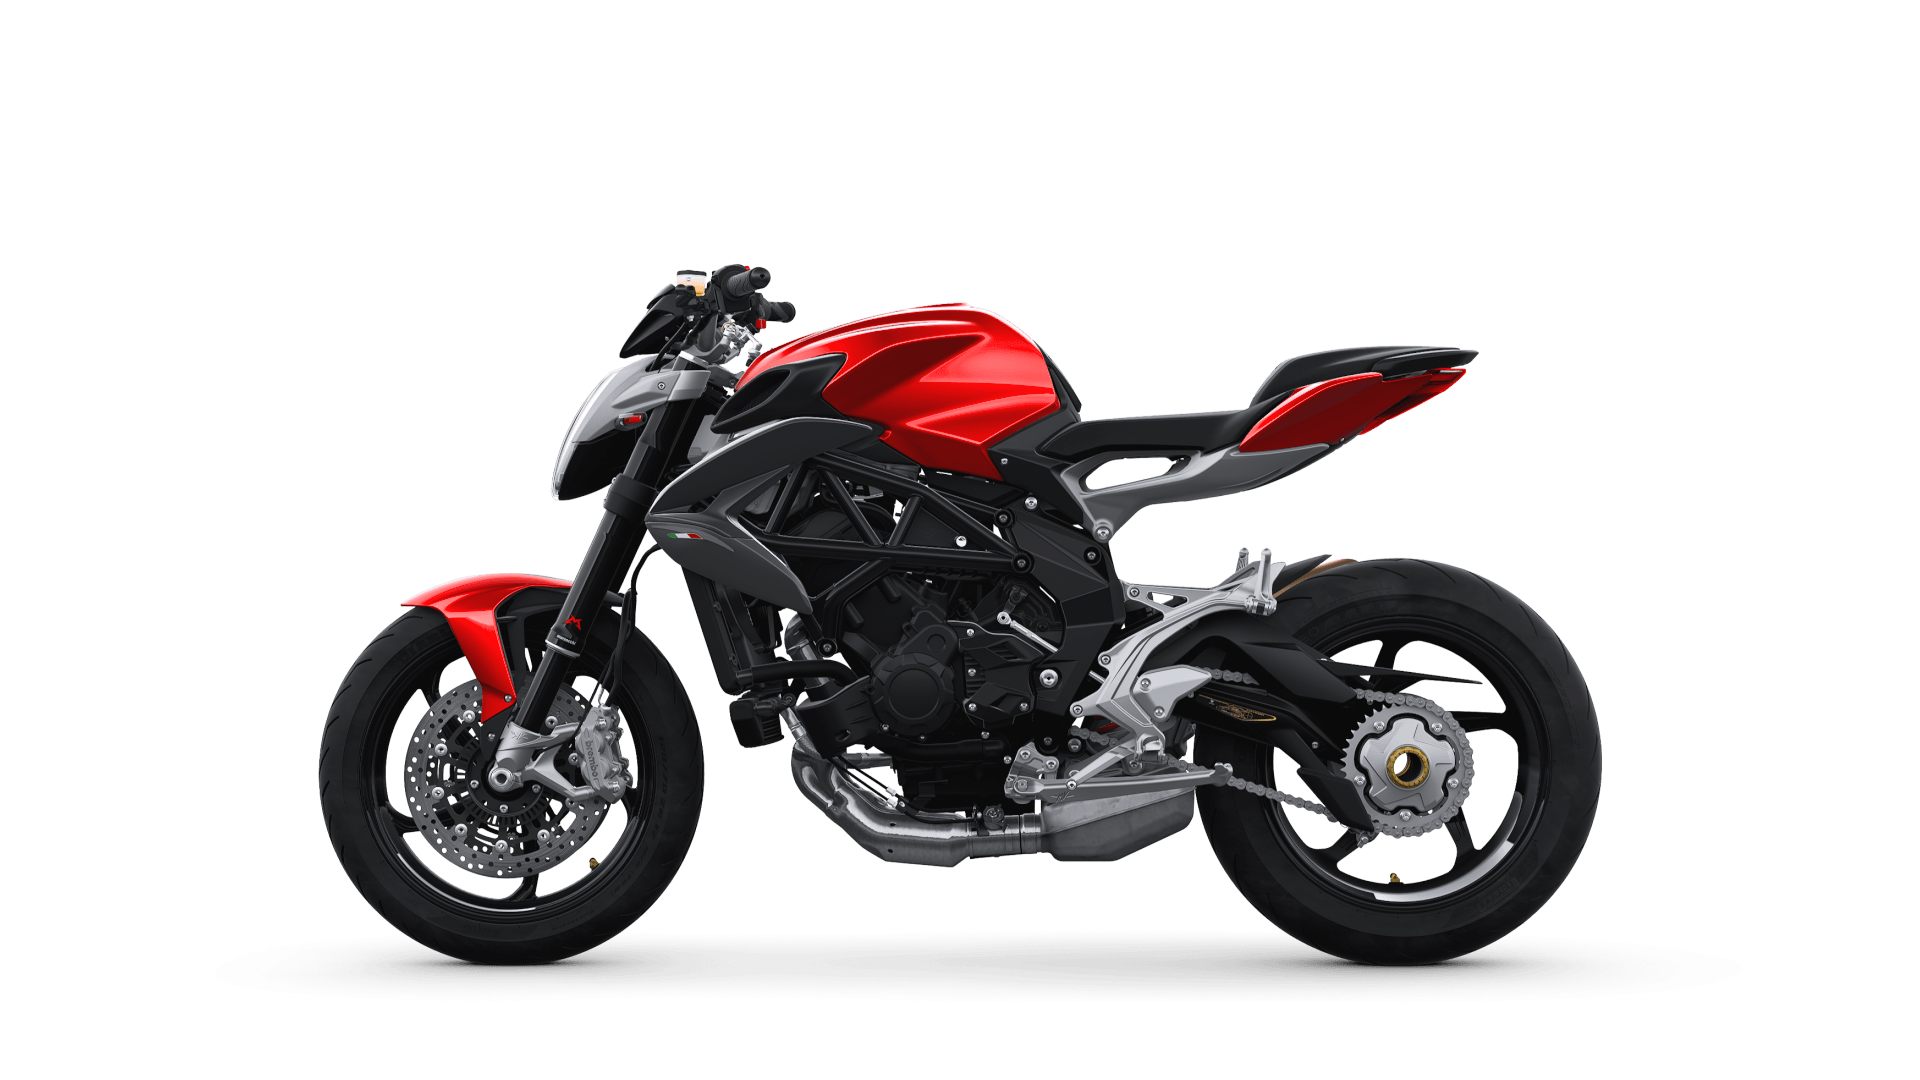 MV AGUSTA BRUTALE800 2019 紅色 - 「Webike摩托車市」